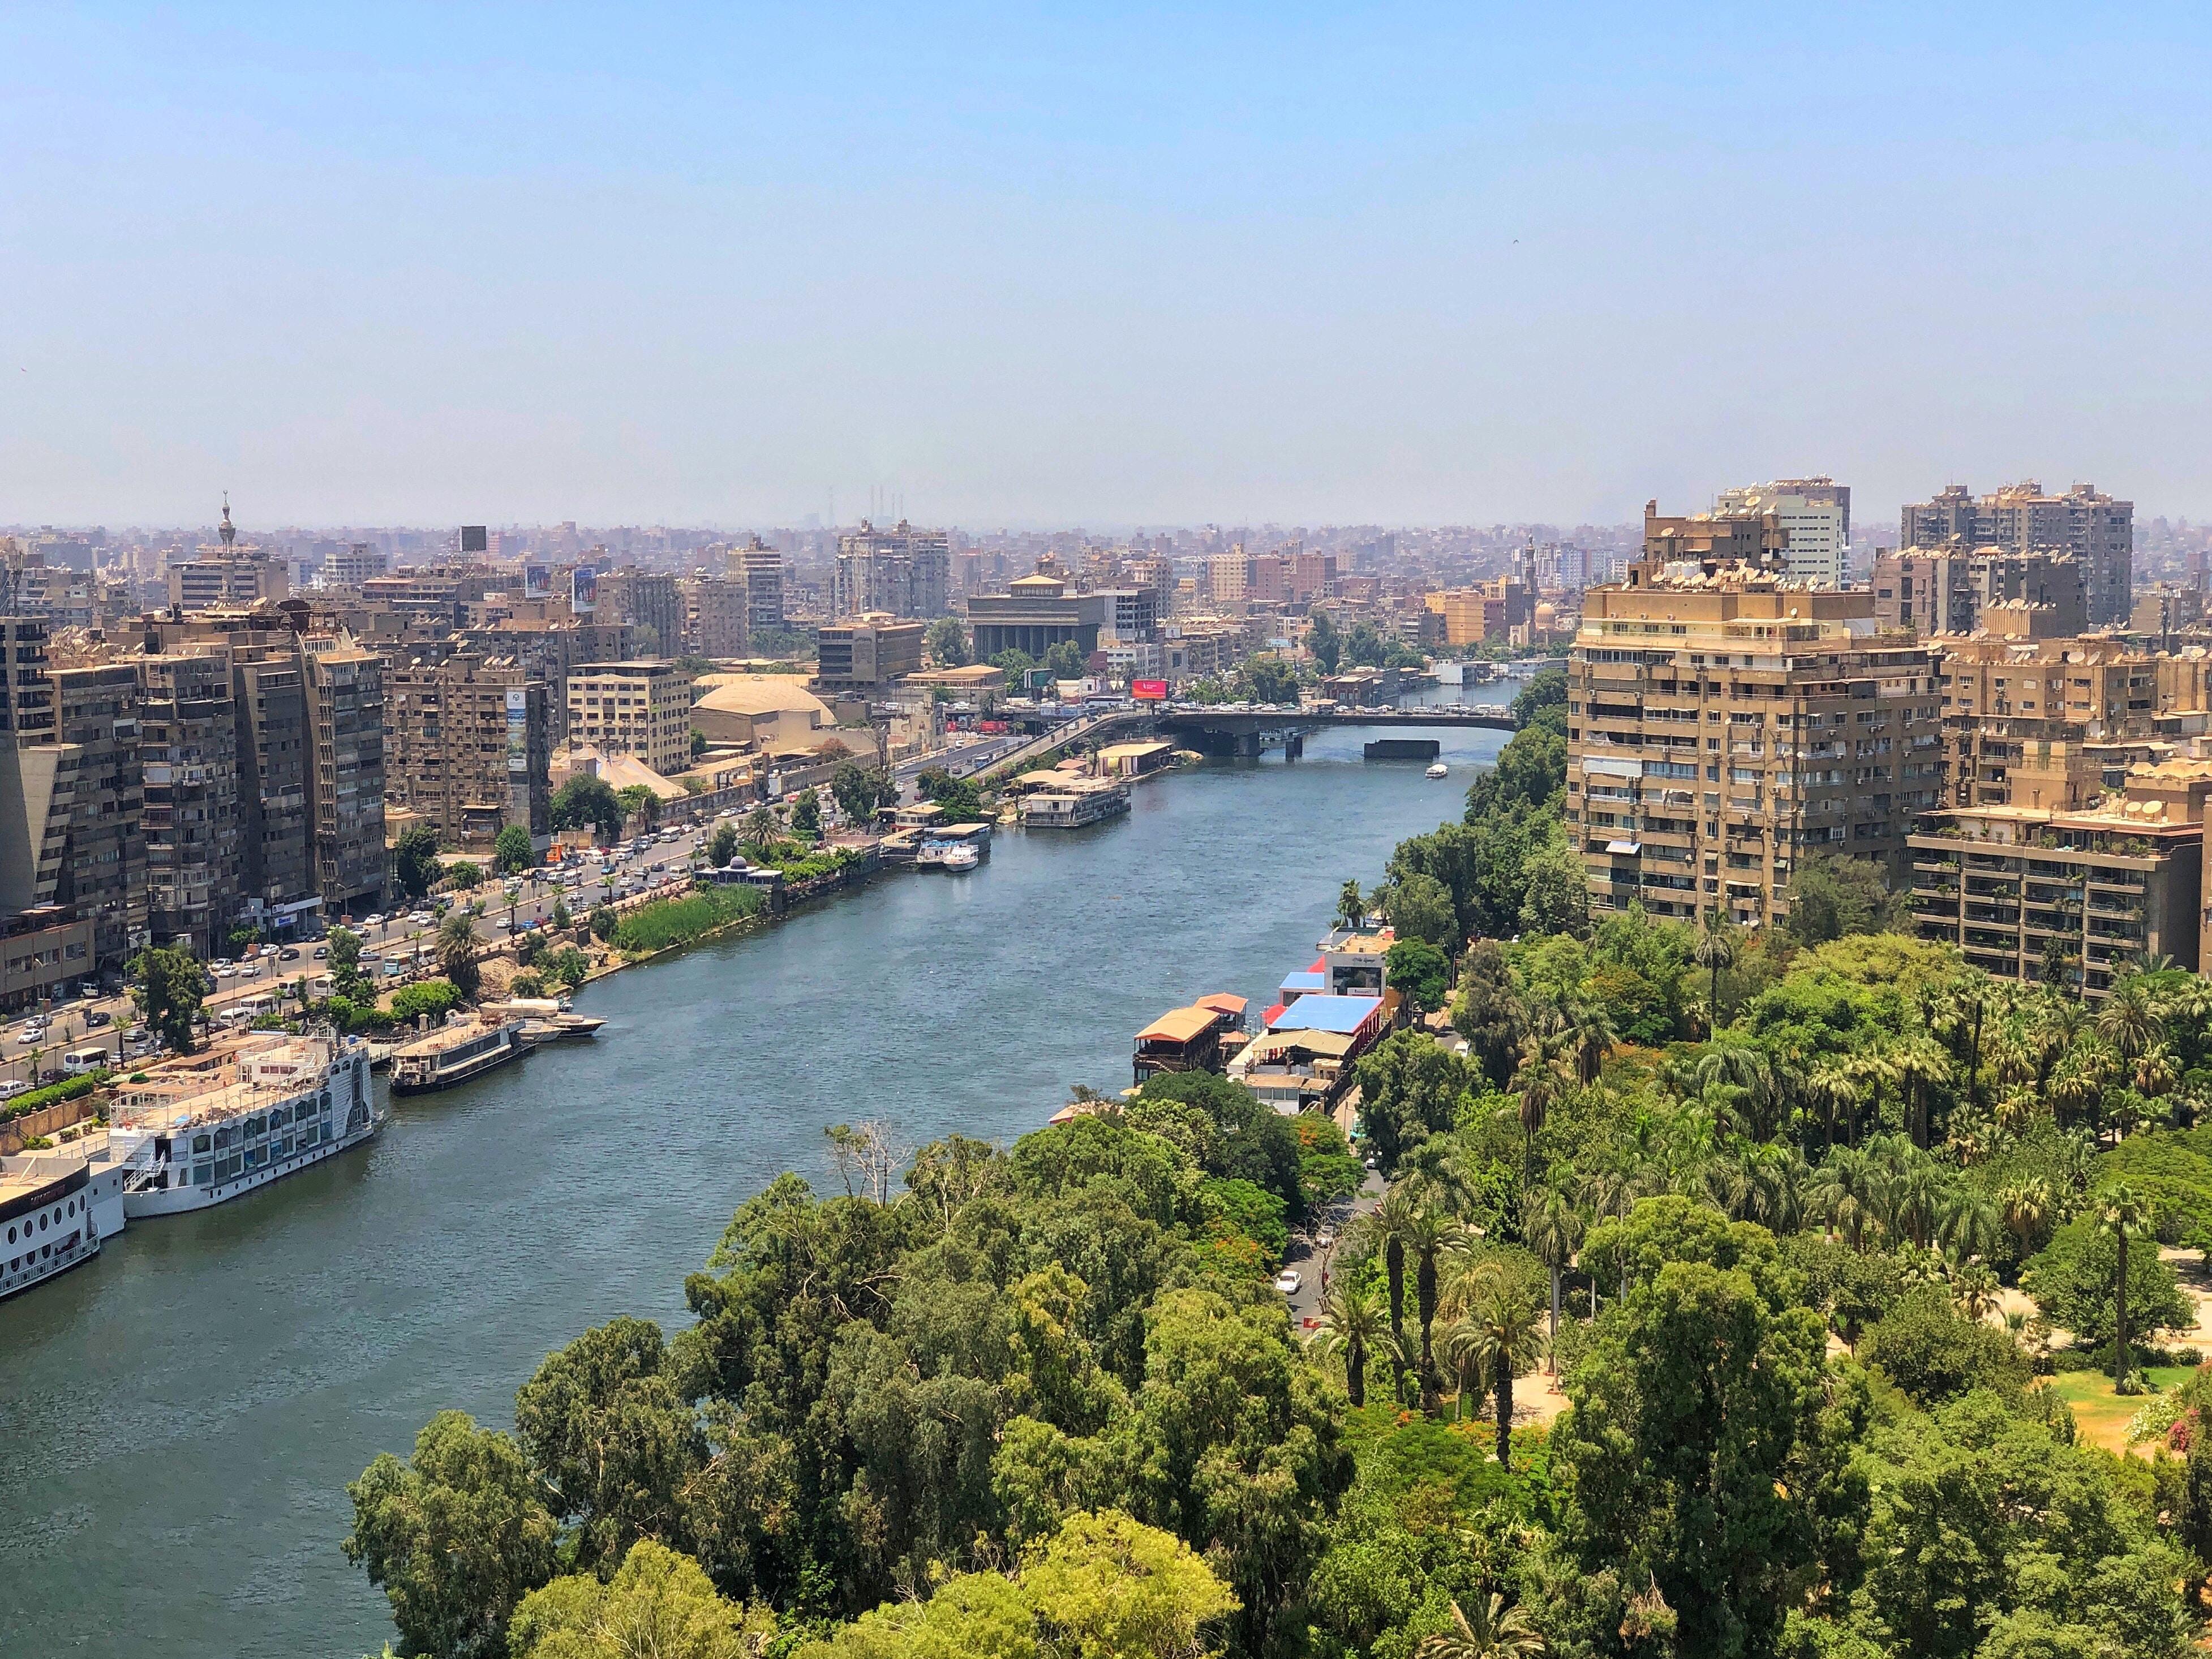 місто Каїр